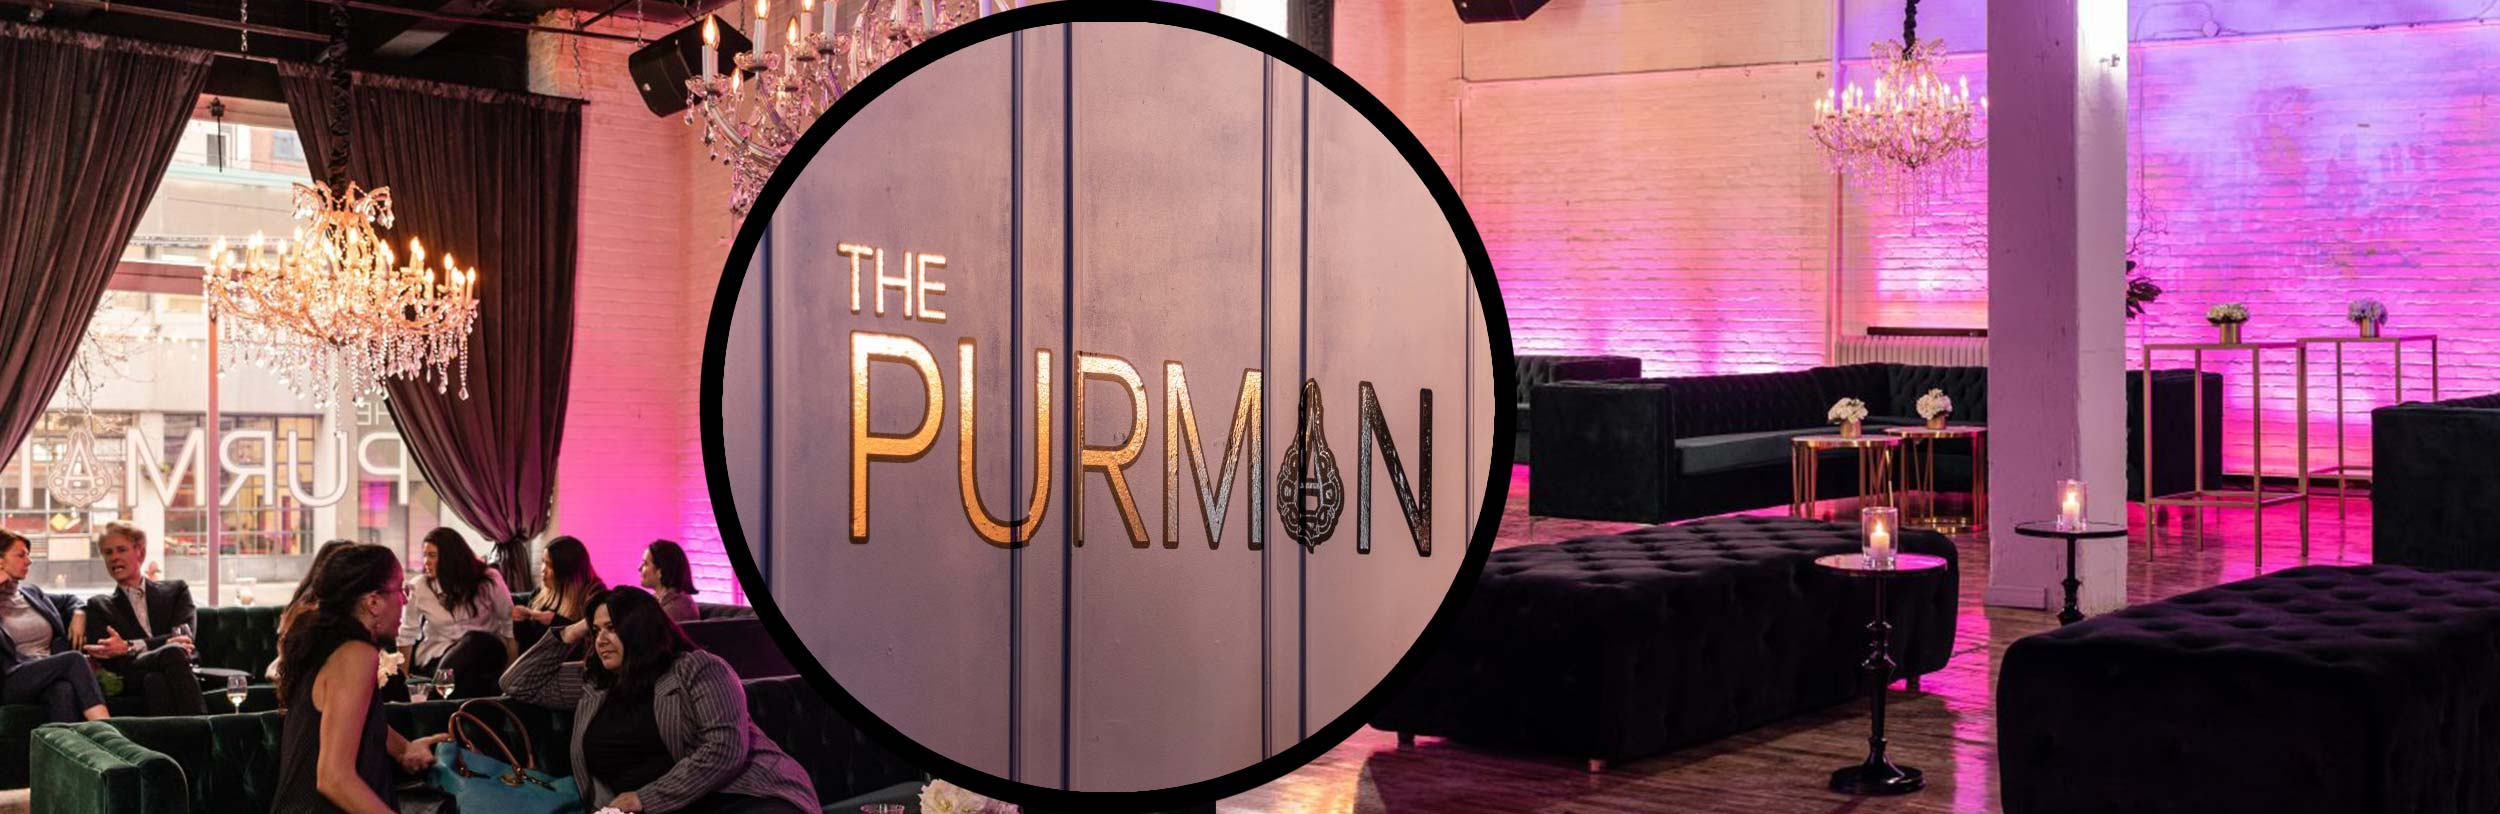 The Purman